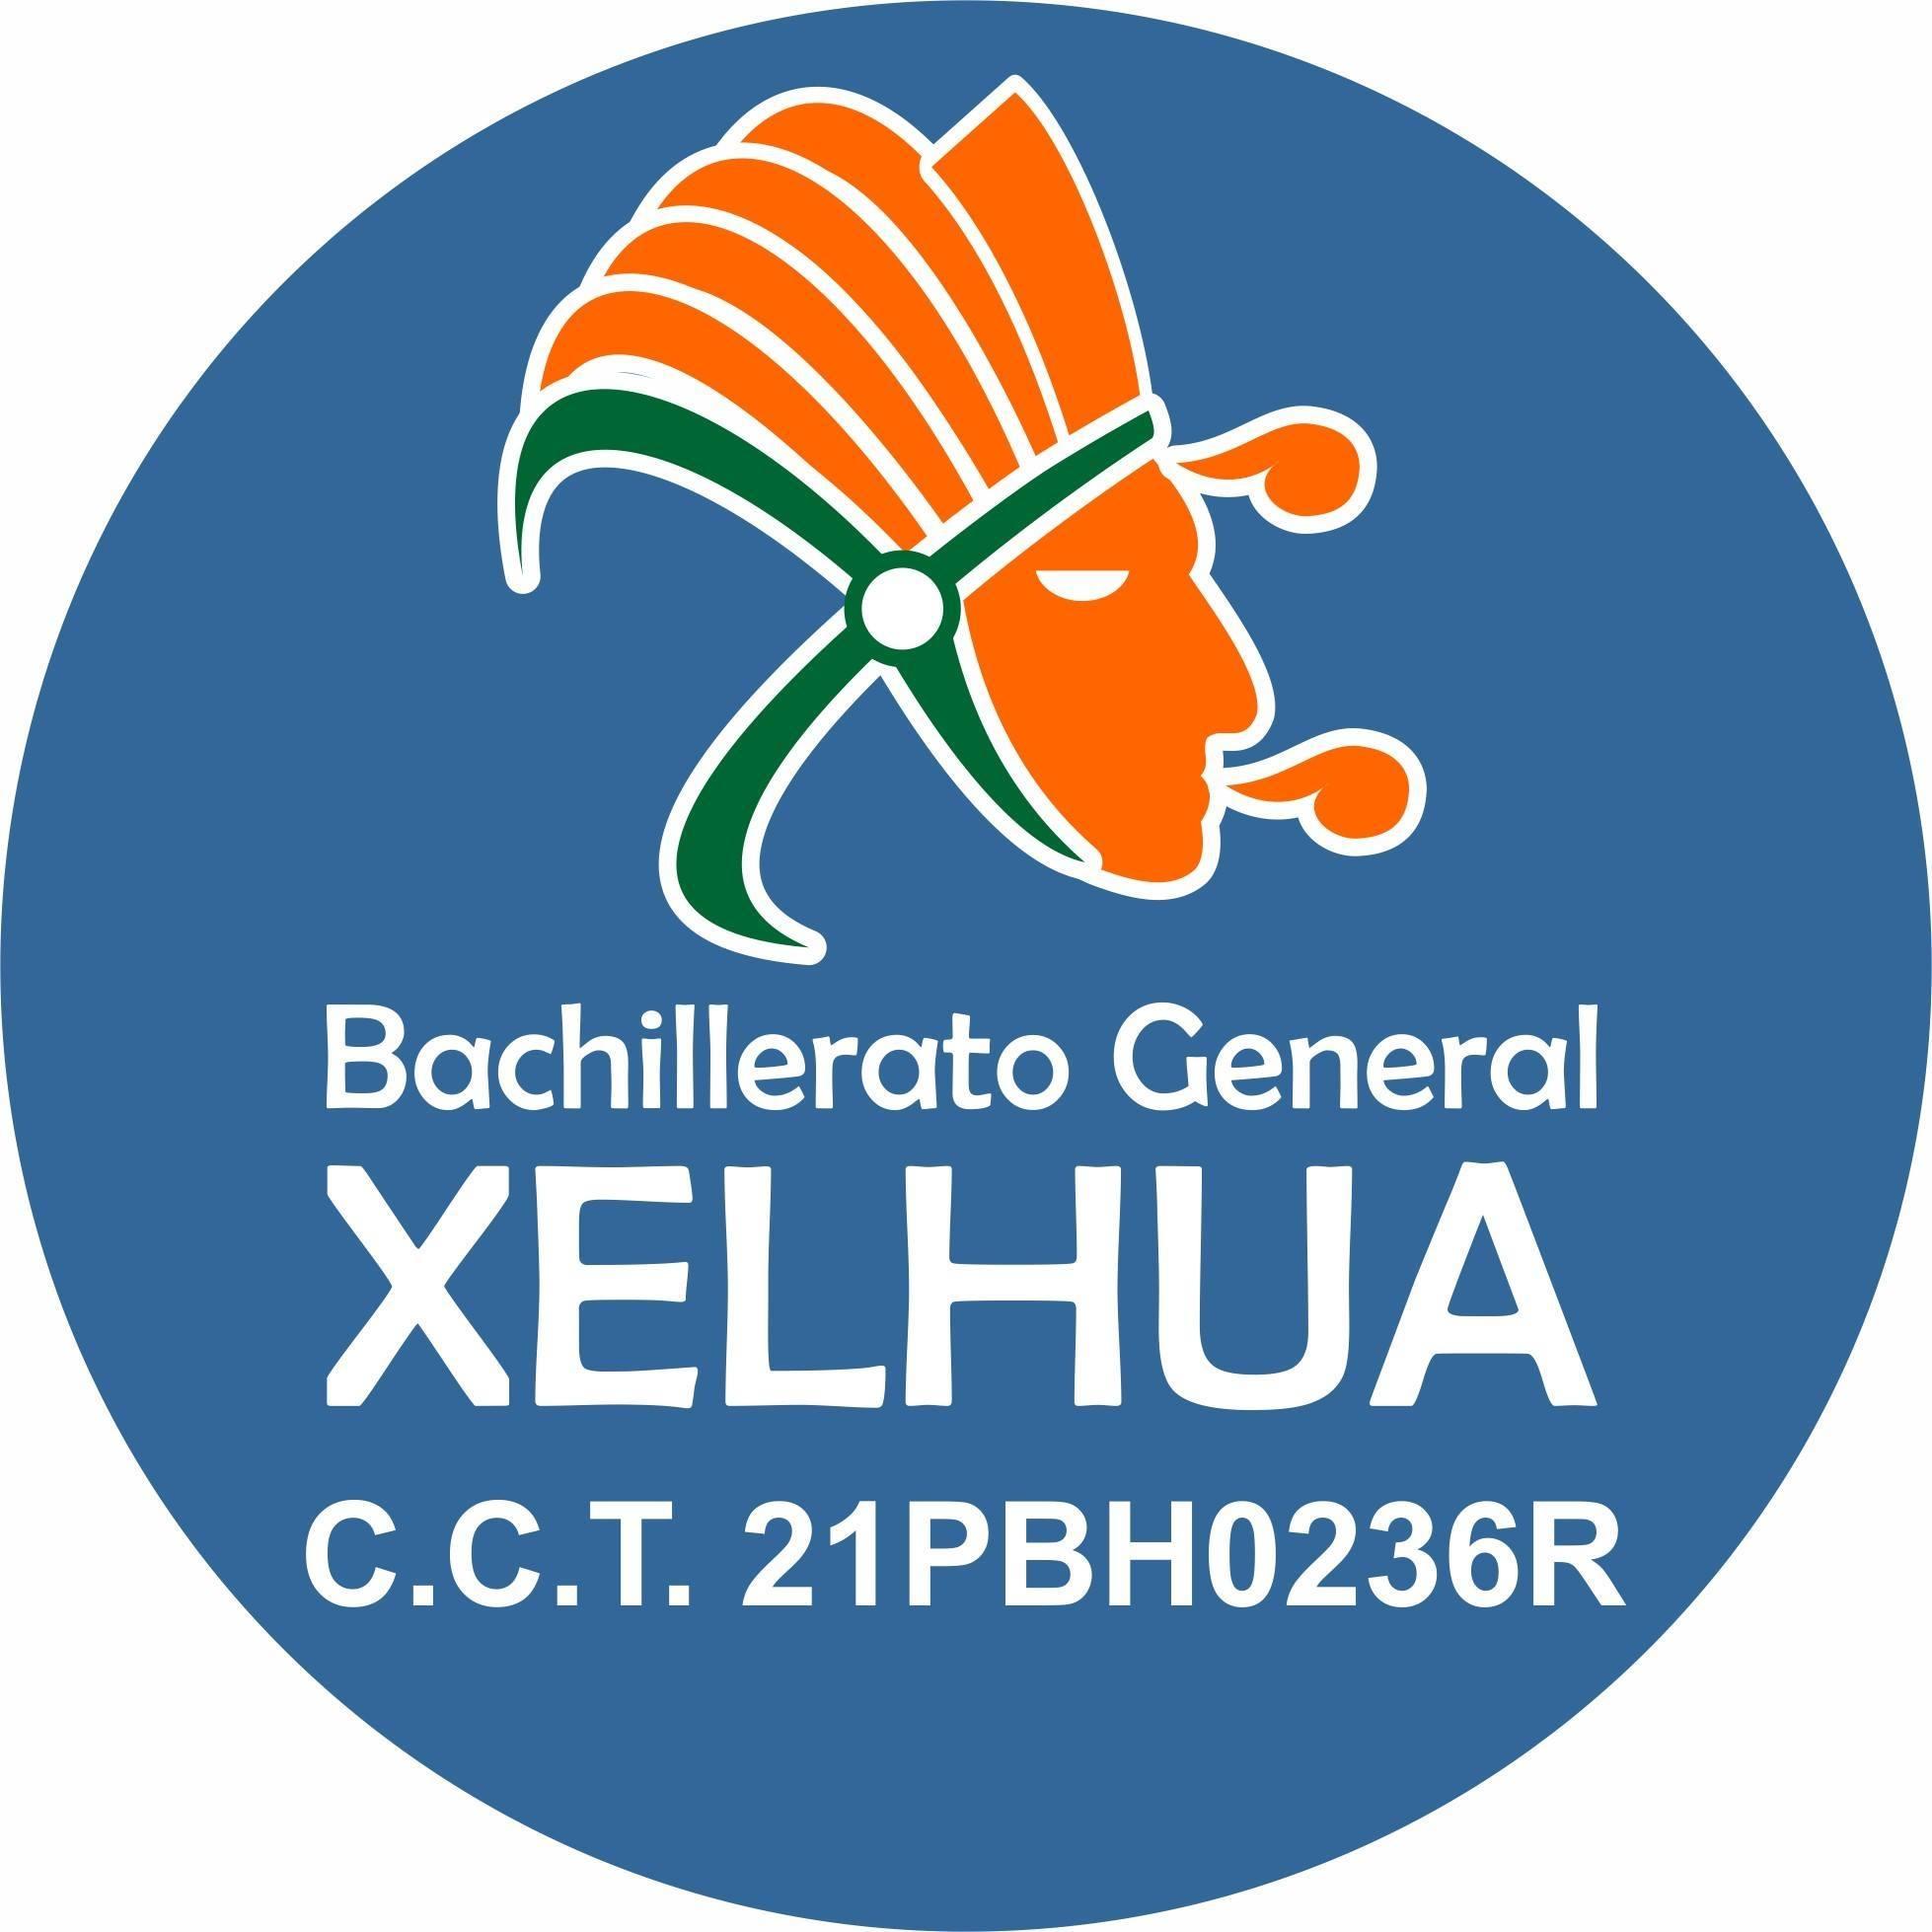 BACHILLERATO GENERAL XELHUA